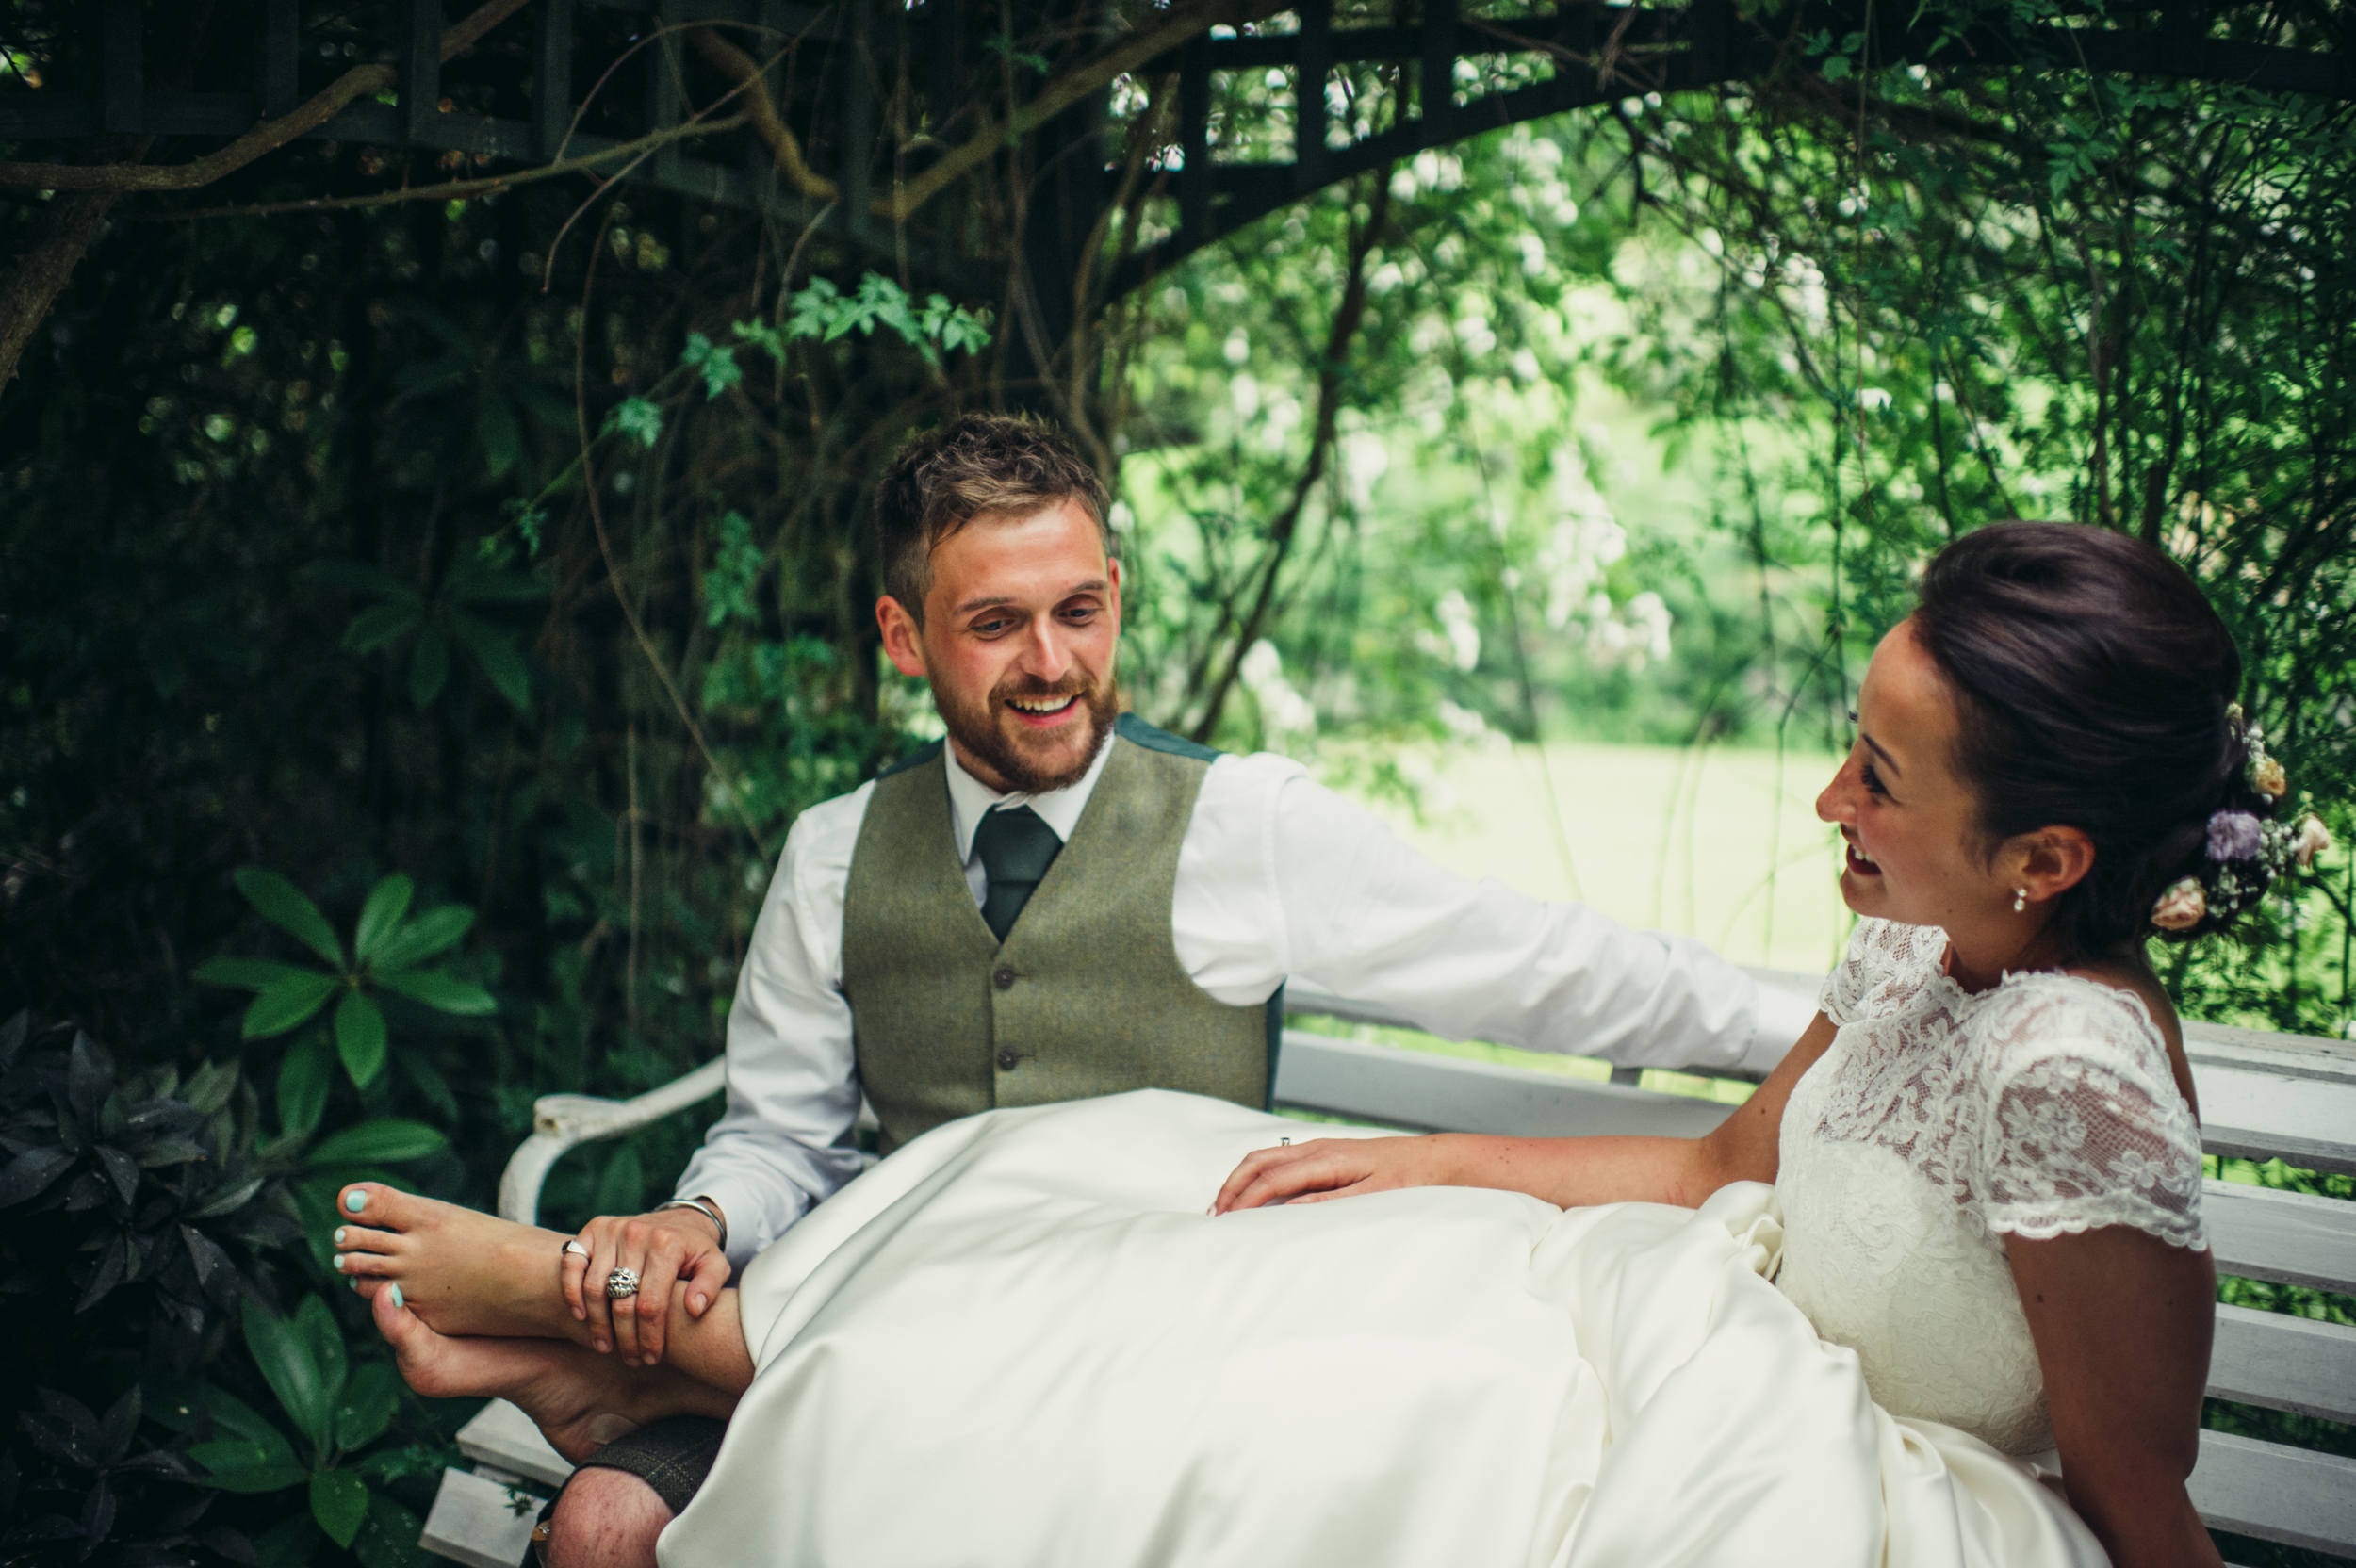 0170-lisa-devine-alternative-creative-wedding-photography-glasgow-edinburgh.JPG